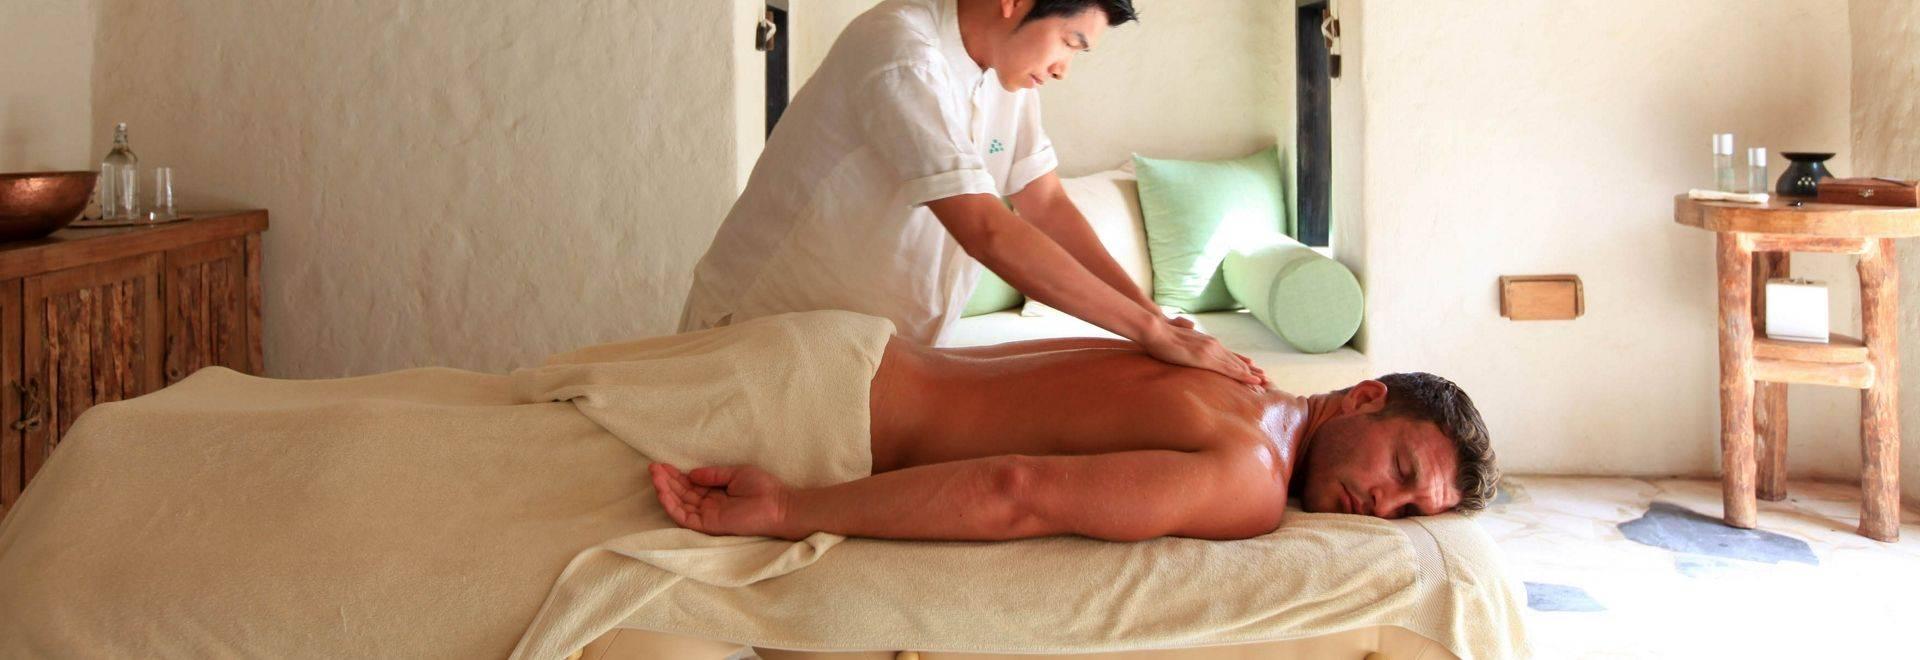 Zighy-Bay-massage.jpg